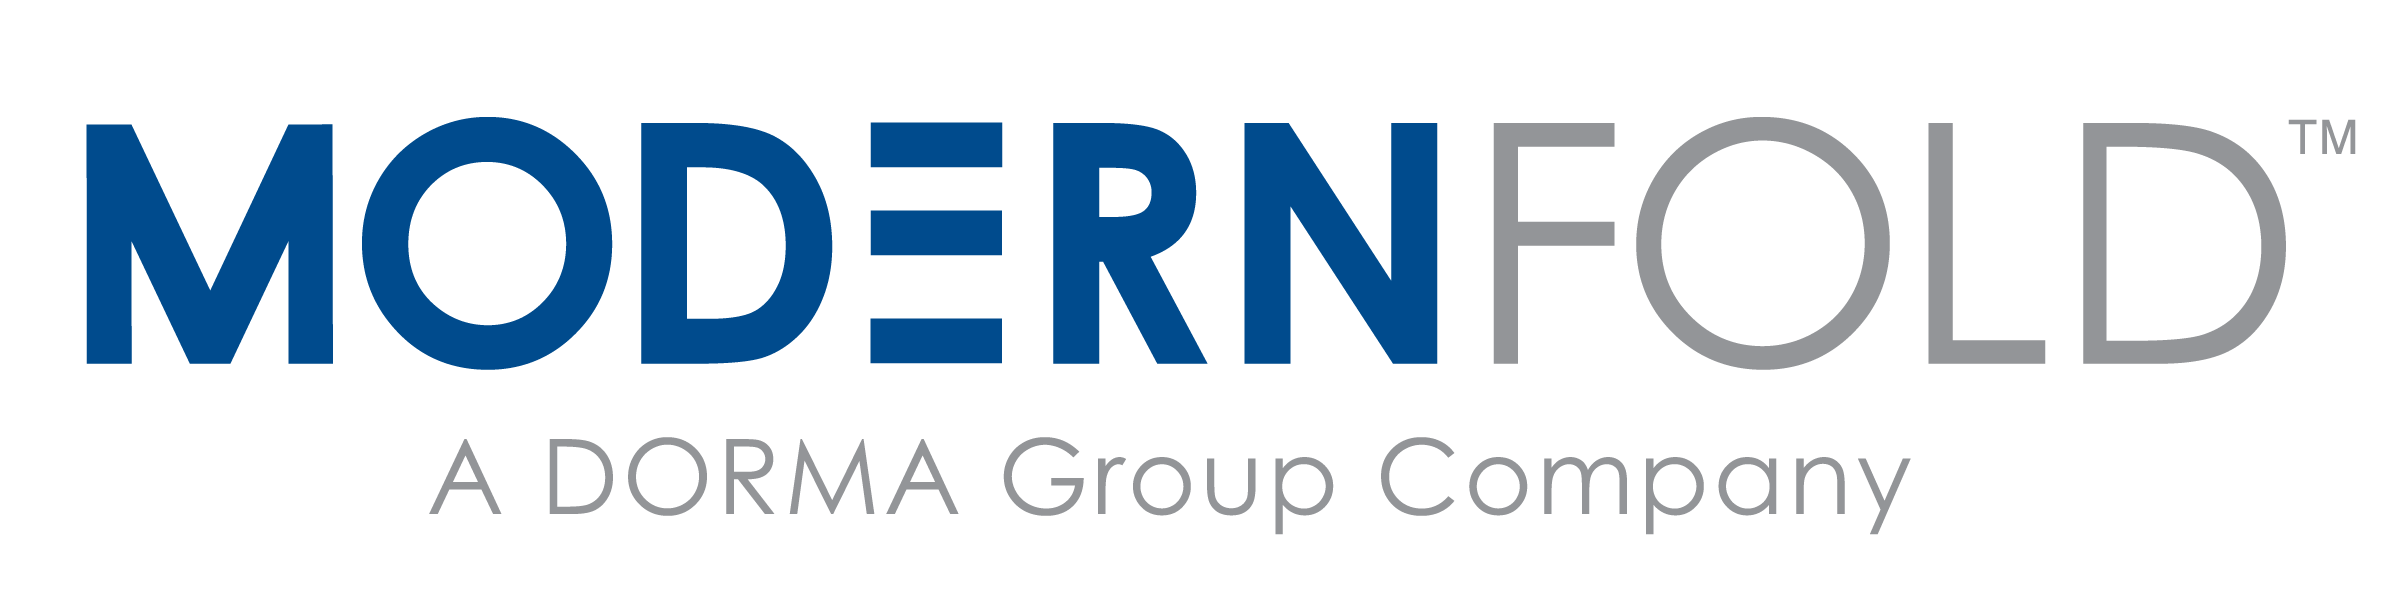 ModernFold - A DORMA Group Company